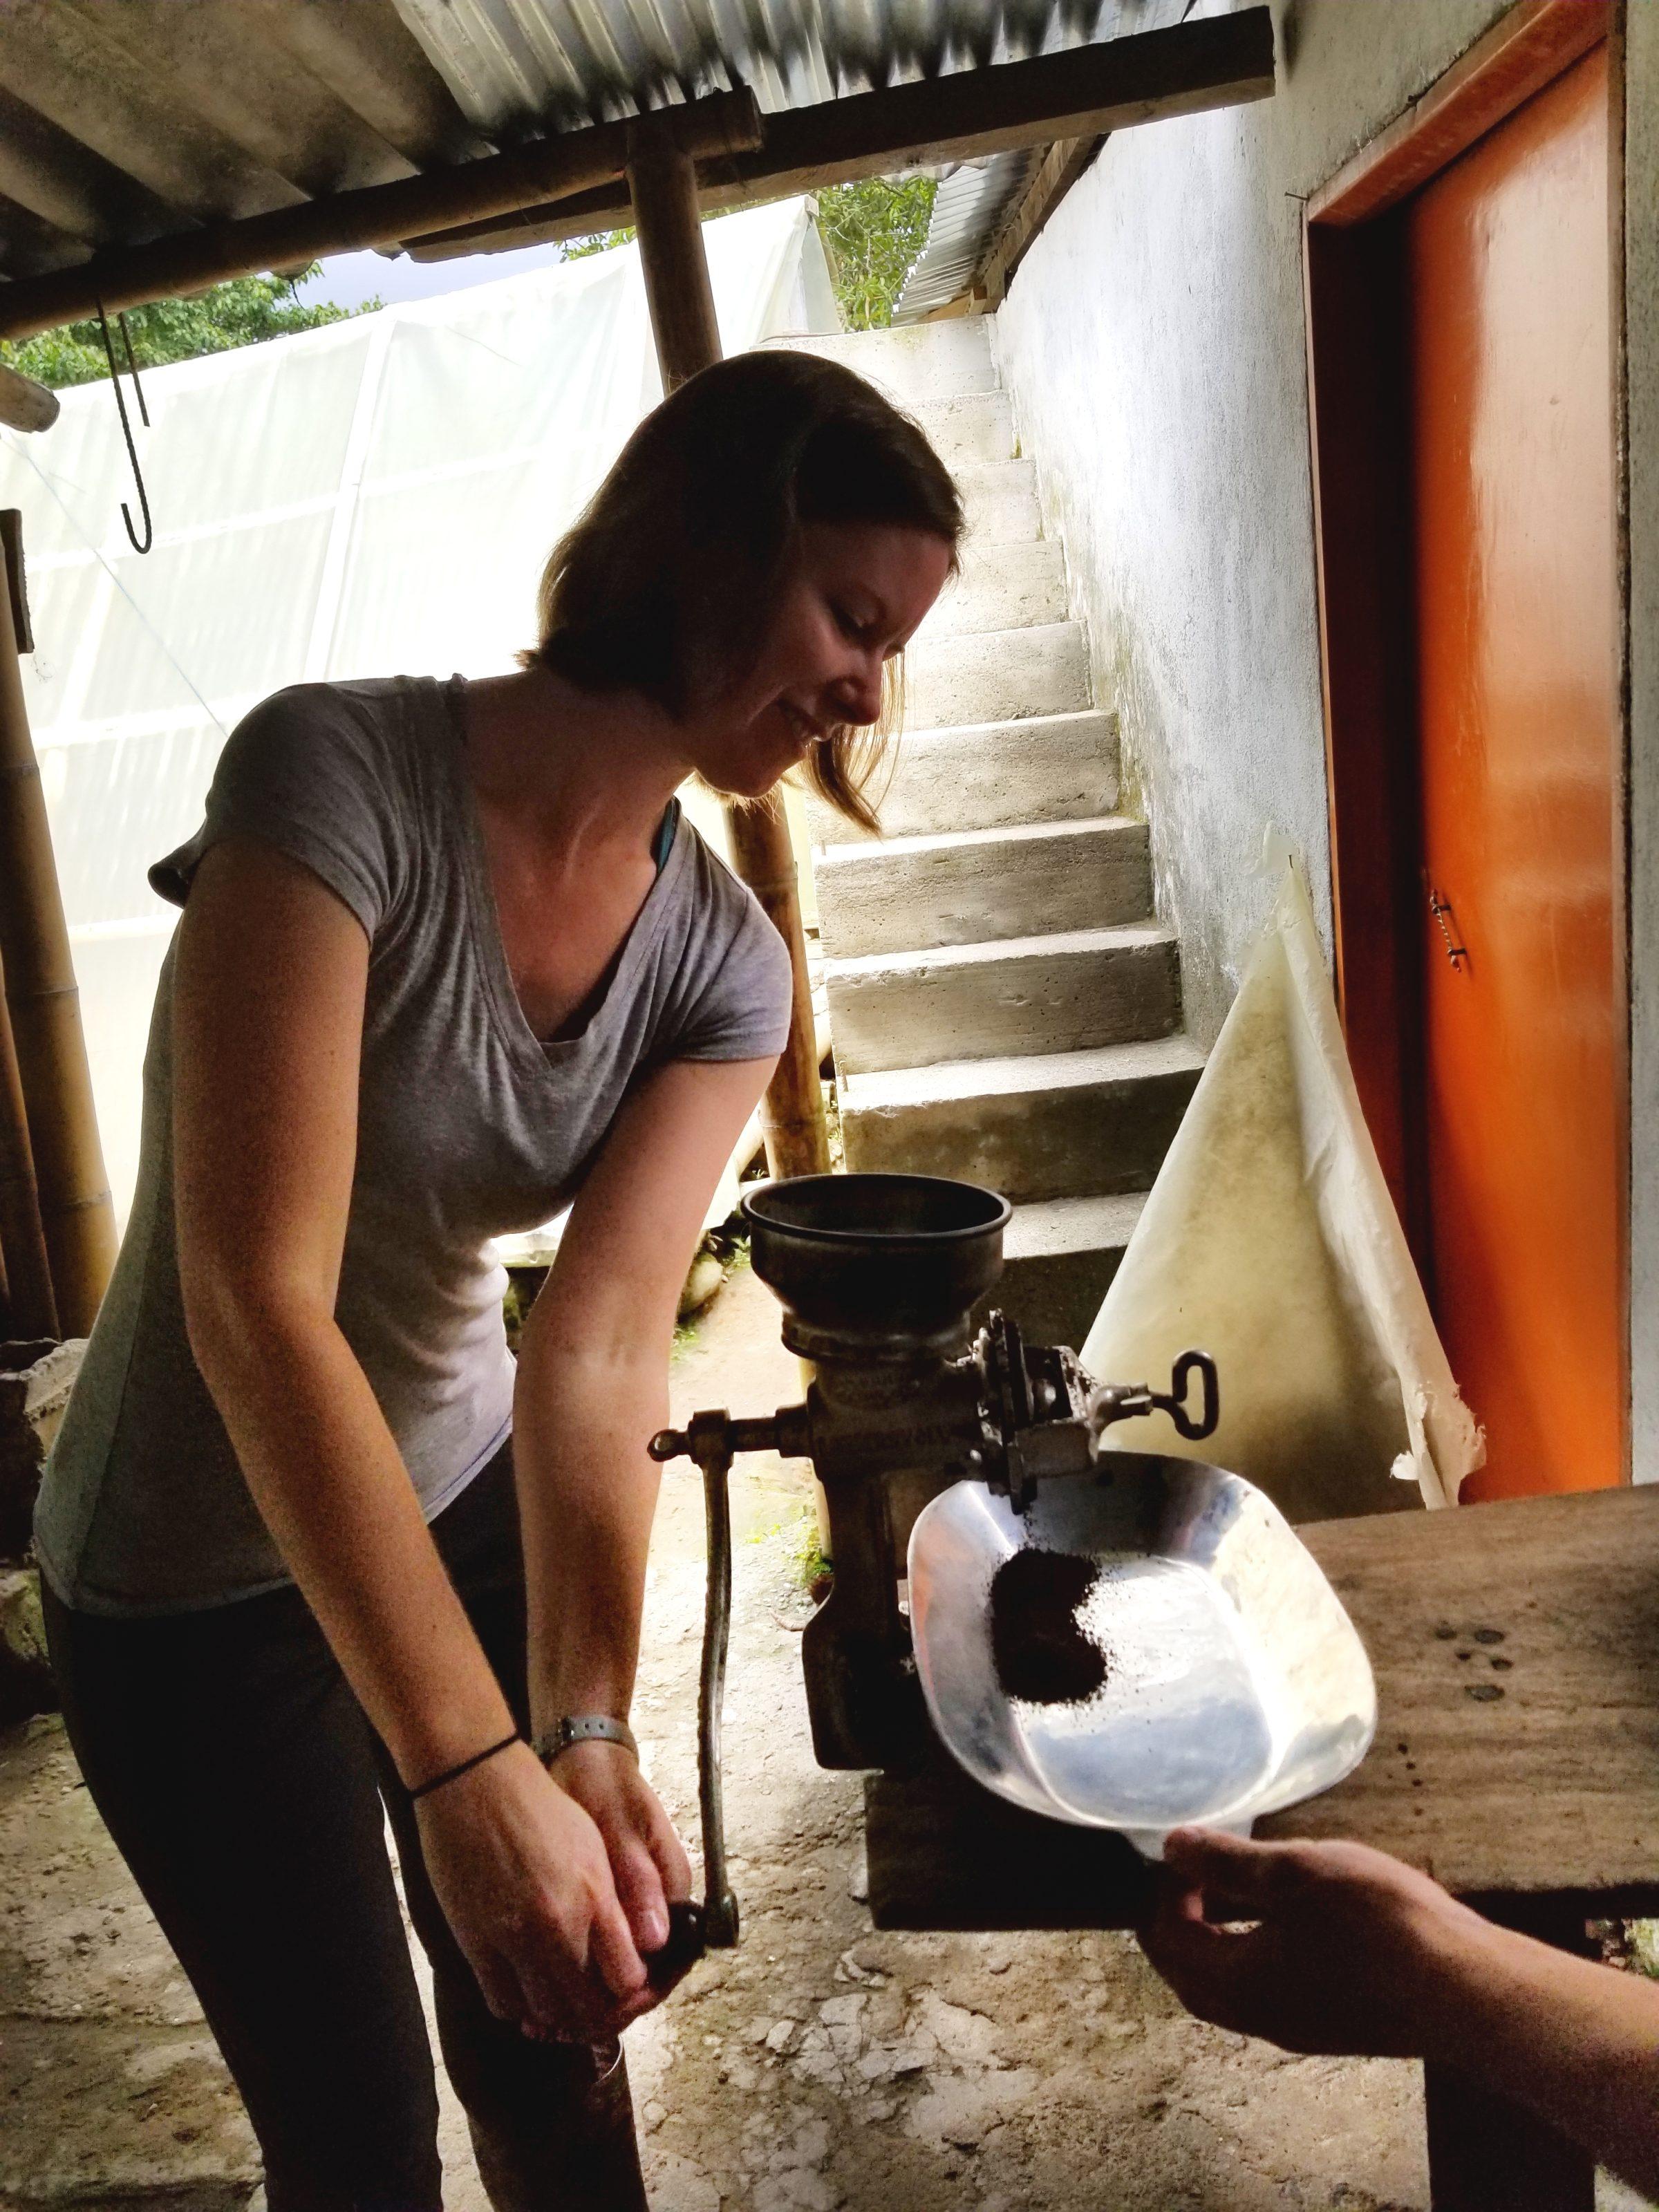 Sarah grinding coffee